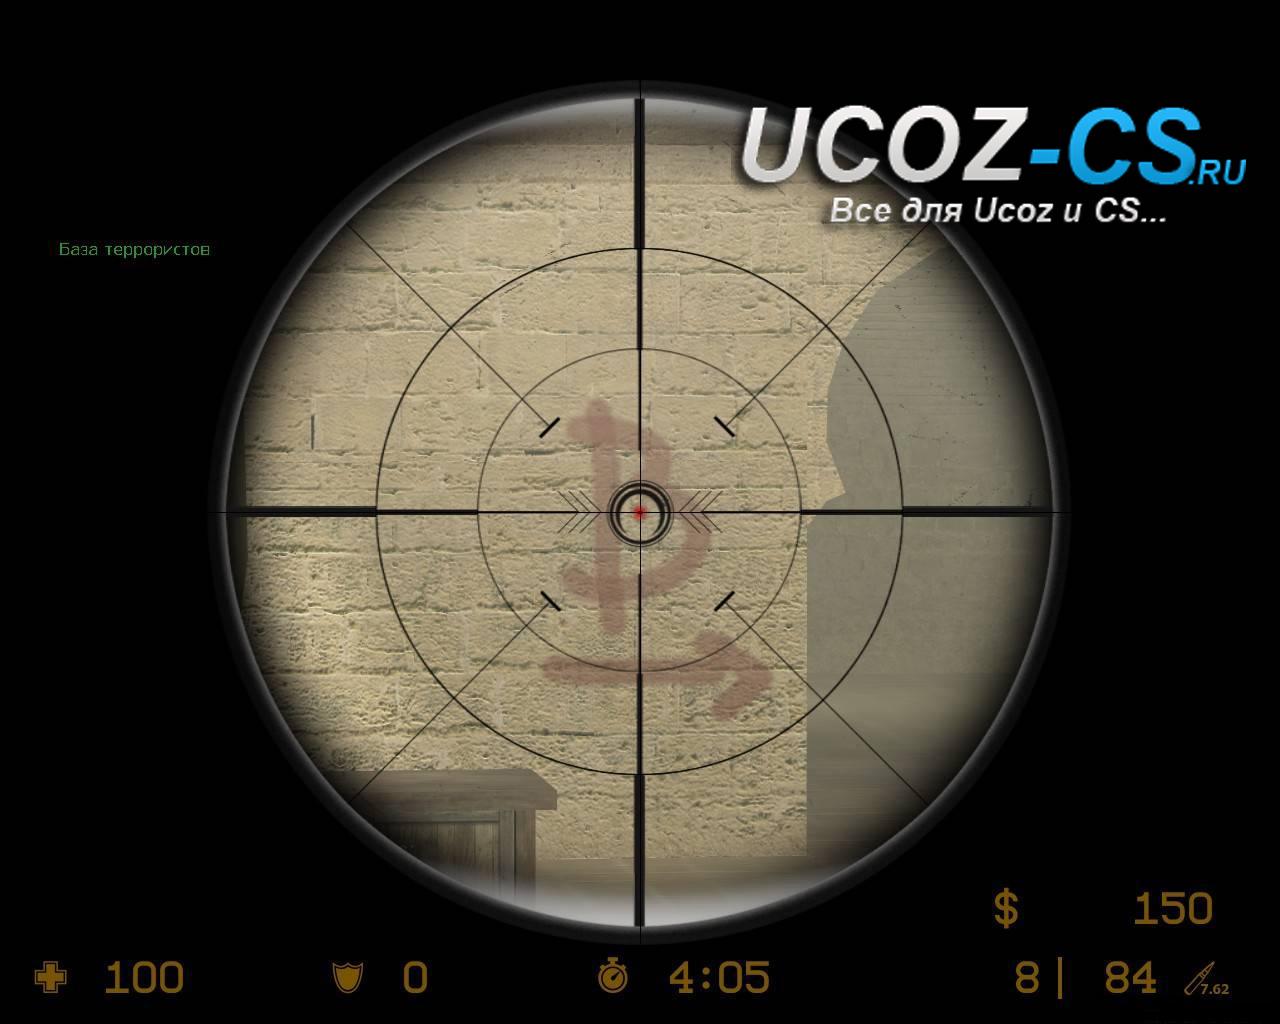 Abstract Laser Aimer Lens для css - Прицелы для CS:S - Все для Counter Strike Source - Каталог файлов - Все для Ucoz и Counter S